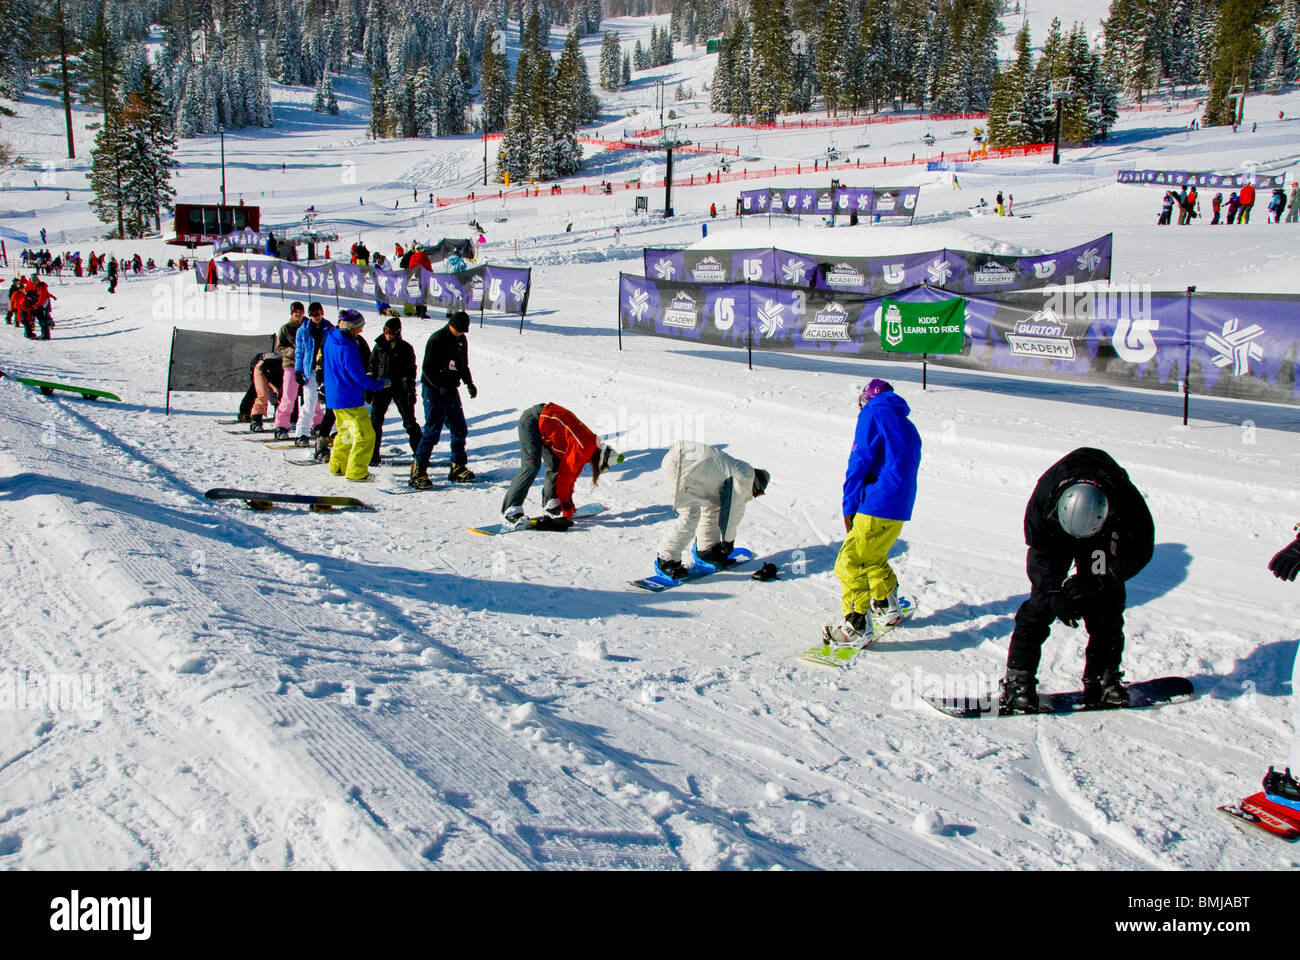 Winter scene Beginners ski and snowboard lessons snowboards skis Northstar Village Resort North Lake Tahoe California USA ice Stock Photo